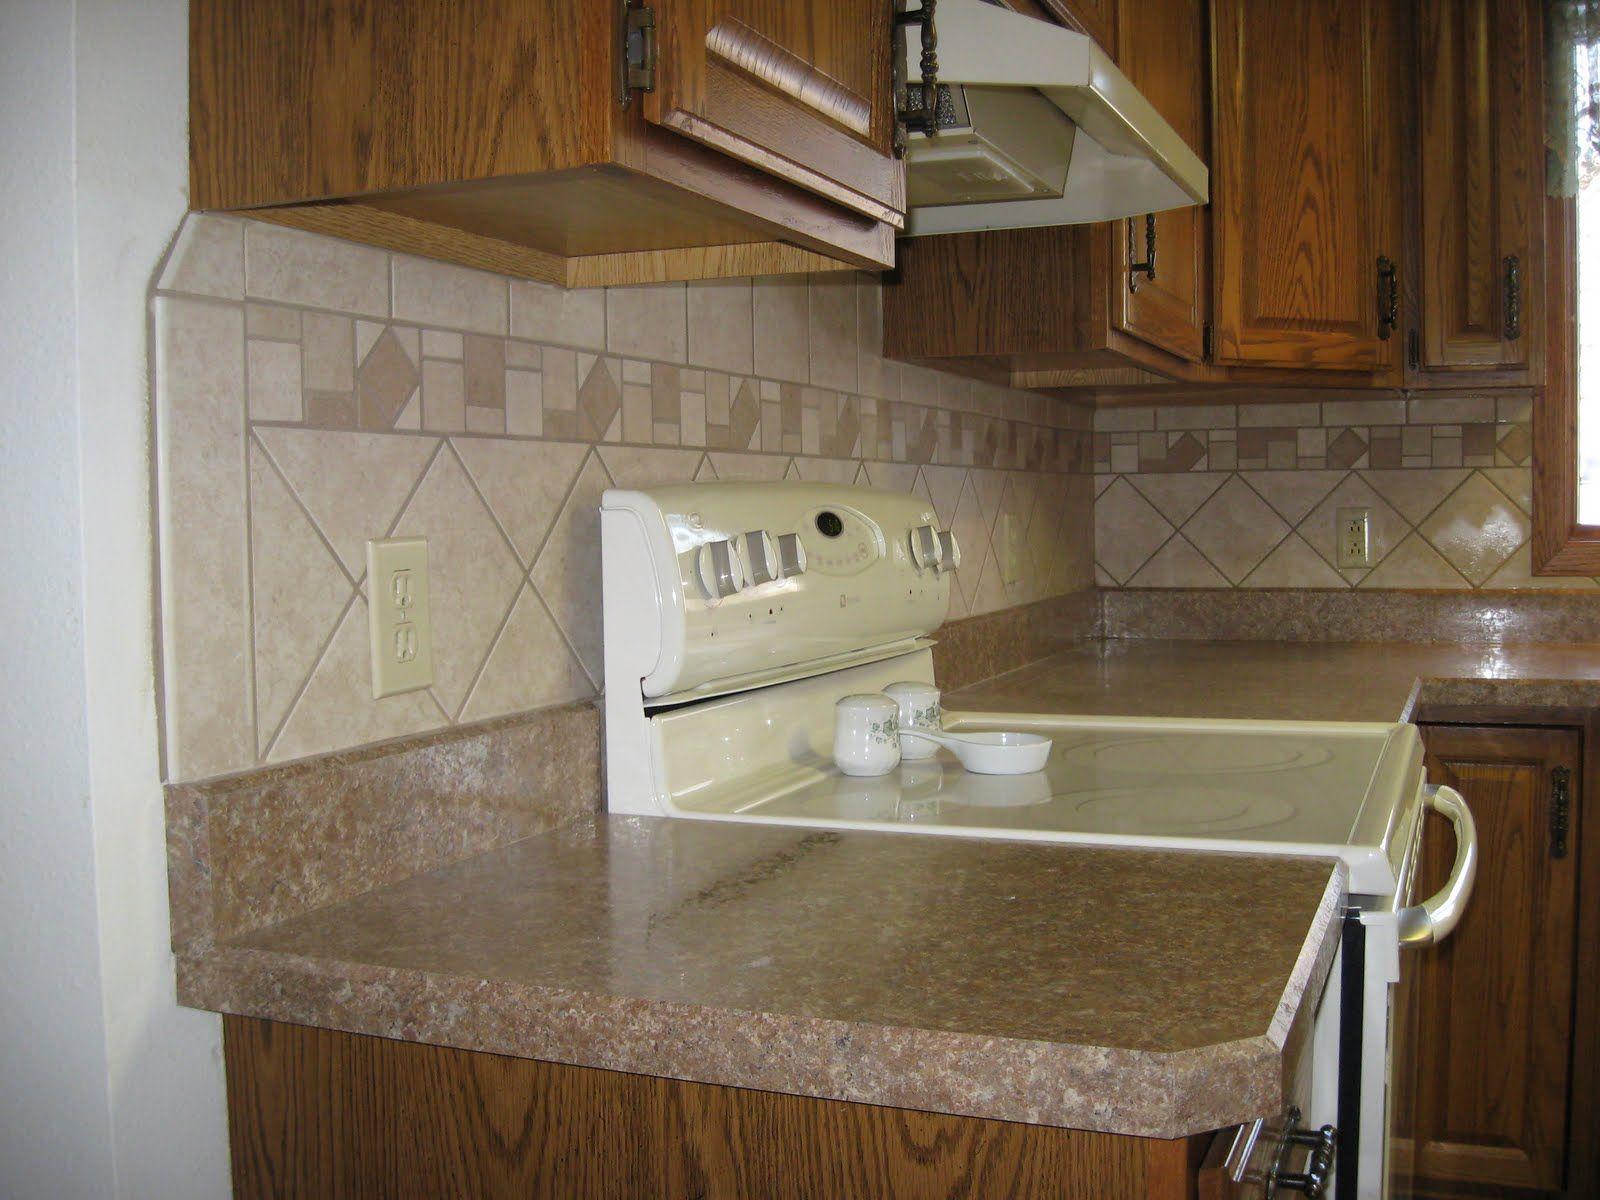 Laminate Backsplash Ideas Part - 44: Kitchens With Wilson Art Hd | High Definition Counter Top And Tile Back  Splash